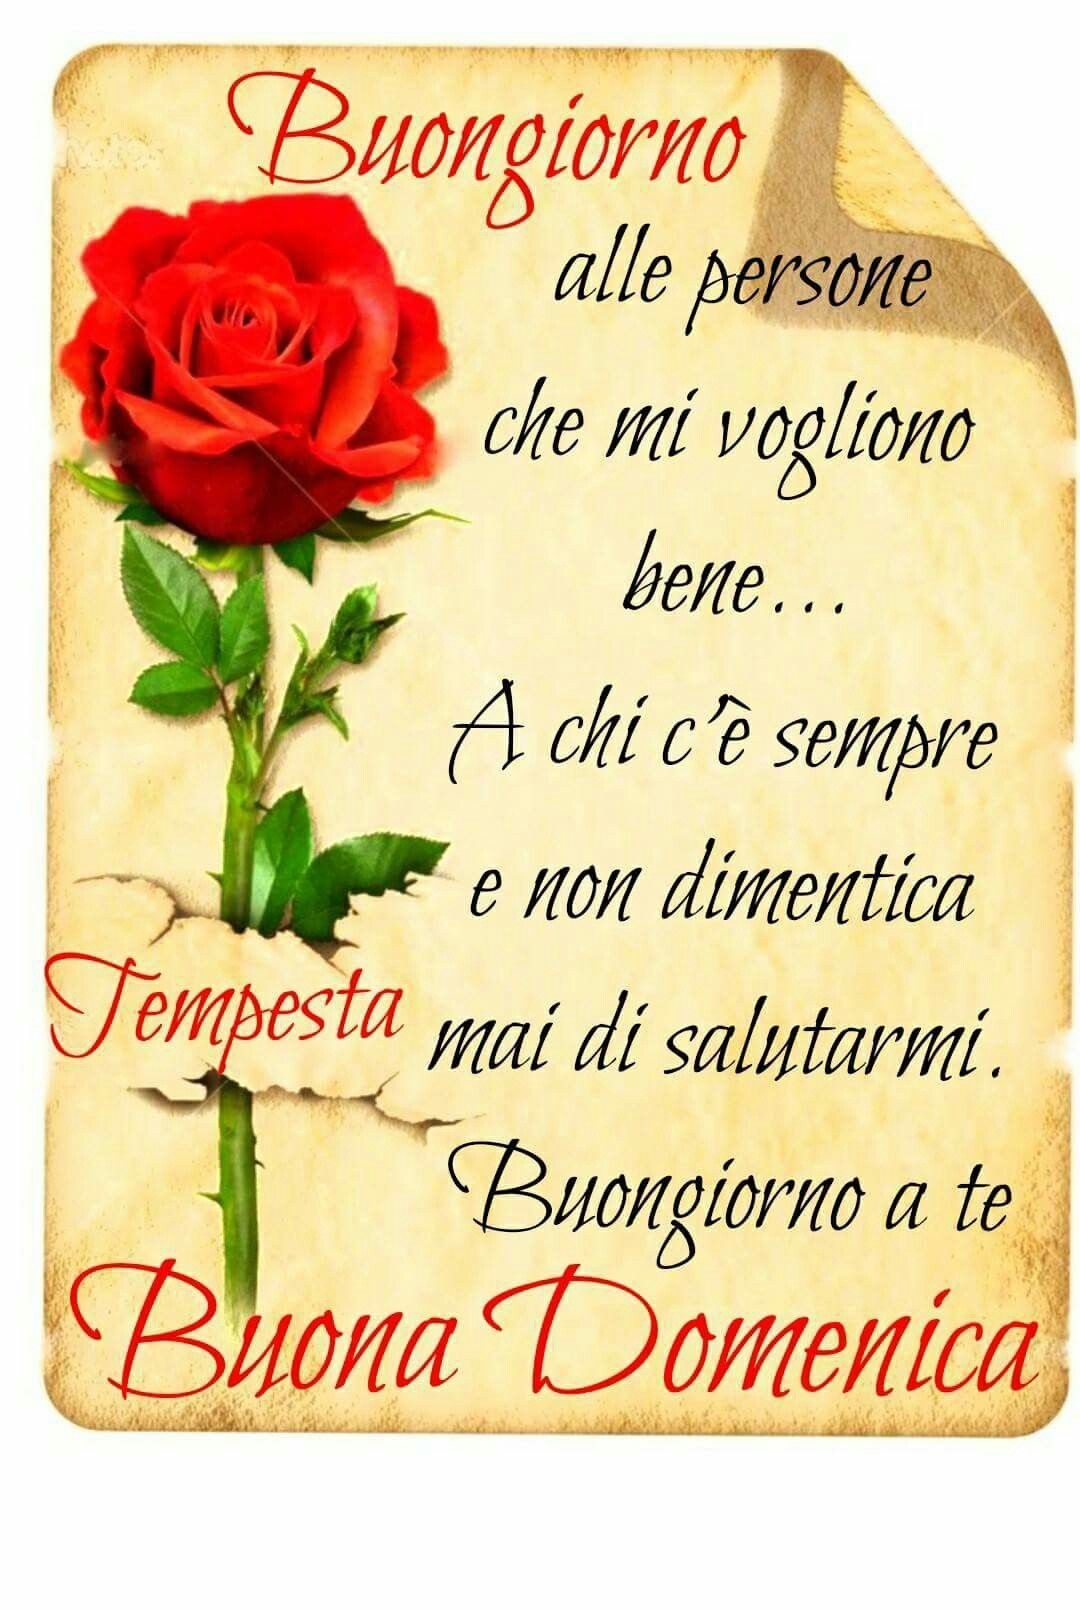 Buongiorno Buona Domenica Buona Domenica Good Morning E Italian